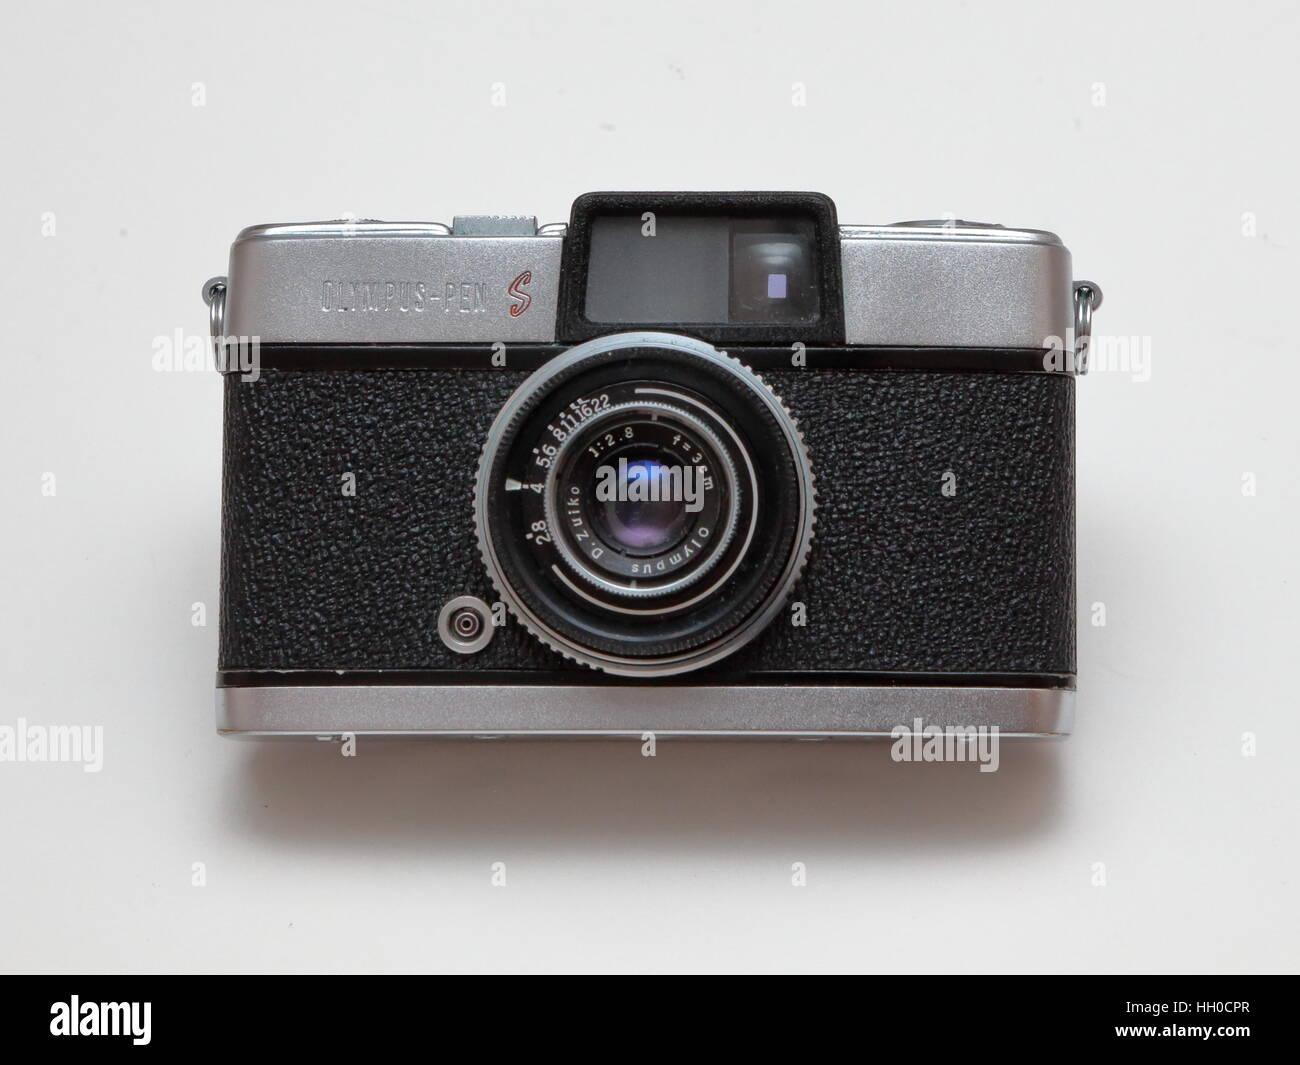 Olympus Pen S 35mm half frame film camera from 1960s - Stock Image